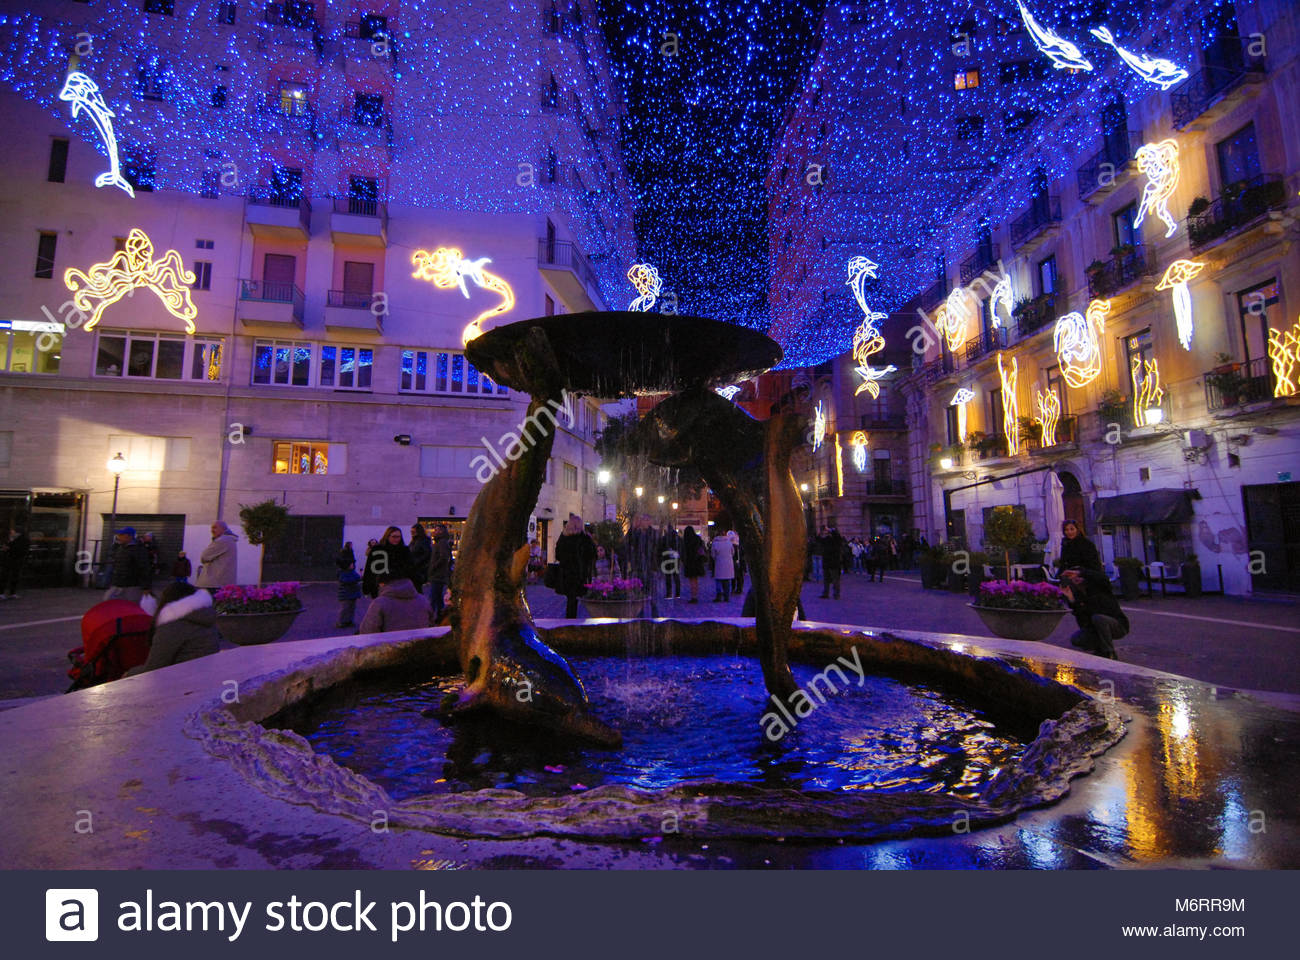 lighting artist in Salerno, Italy Stock Photo